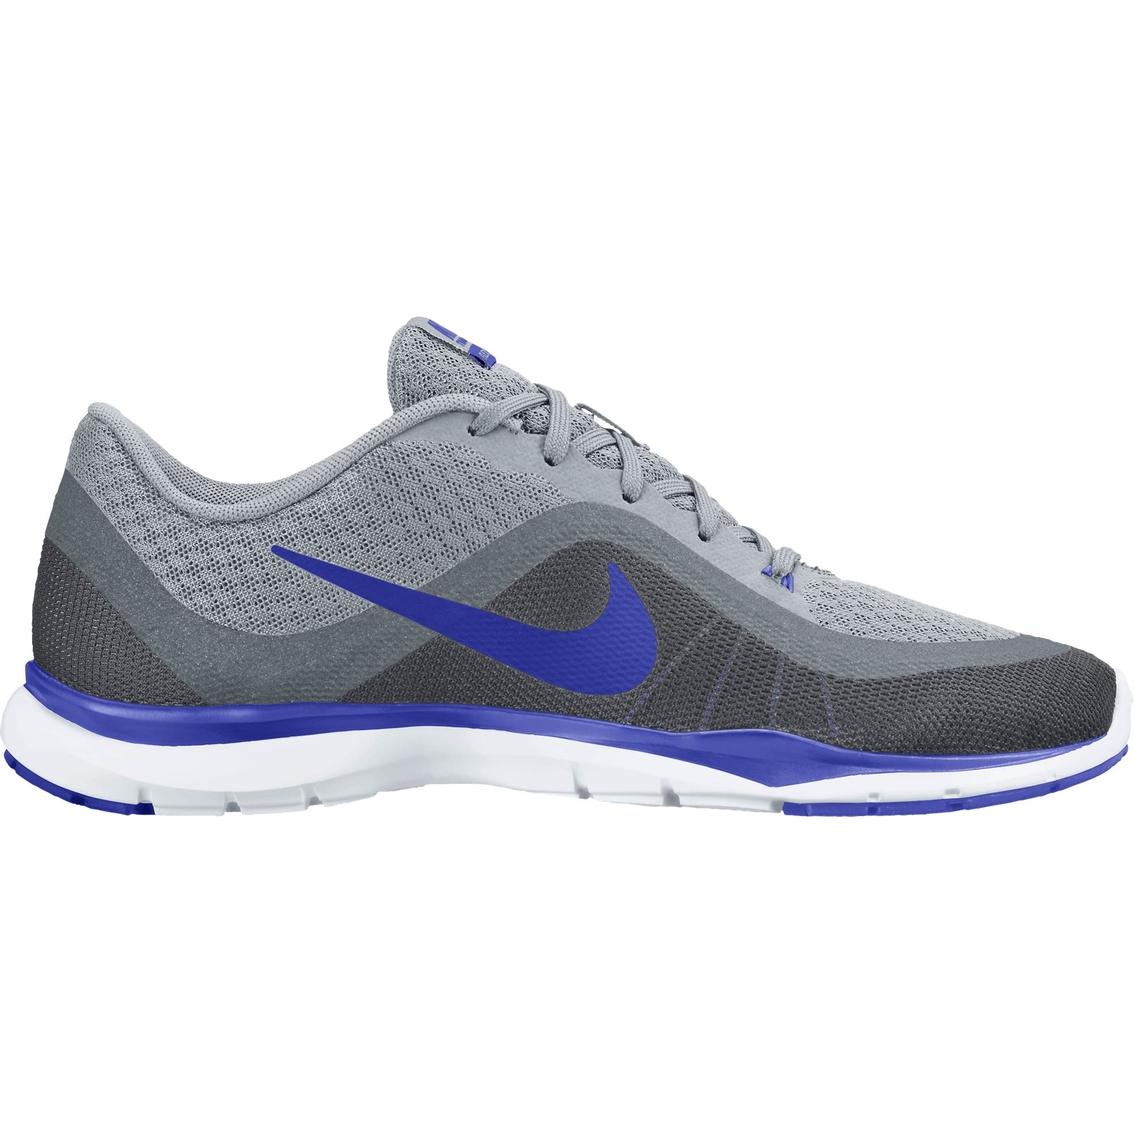 7f3327b108bf Nike Women s Flex Trainer 6 Training Shoe